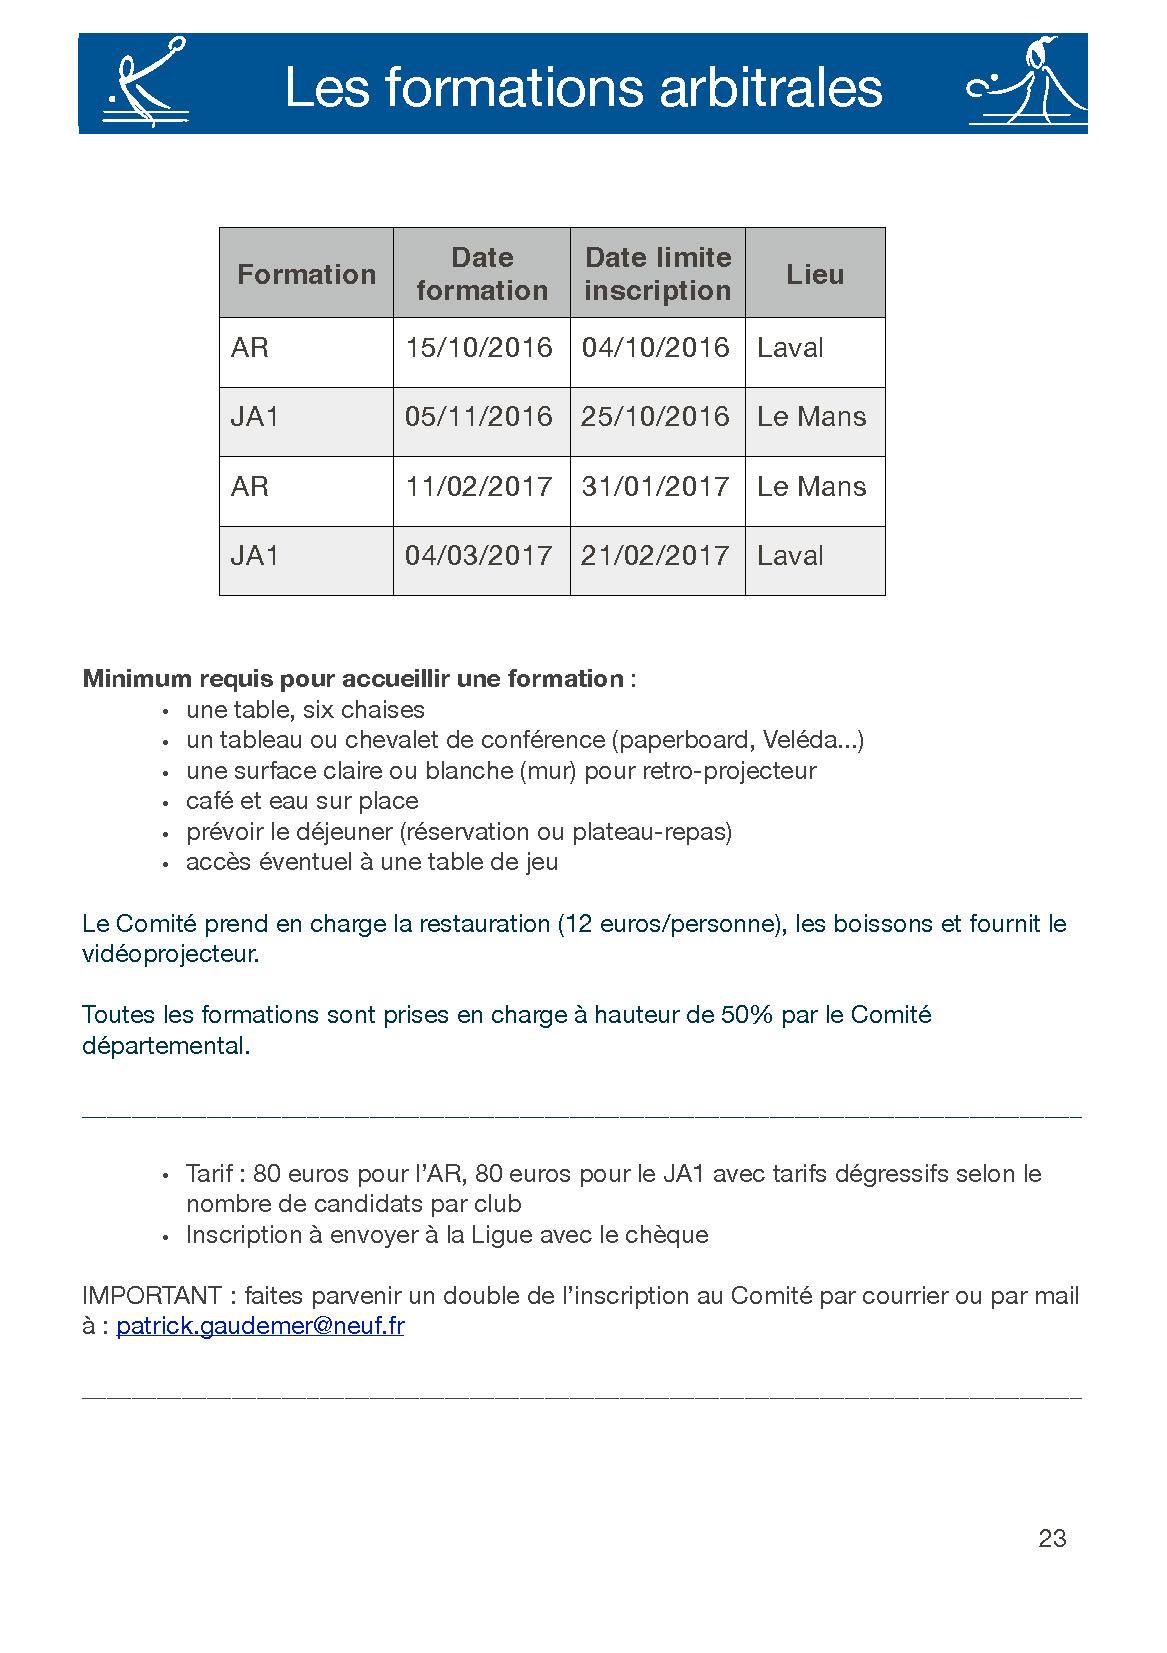 Formations AR & JA1 dans la Sarthe